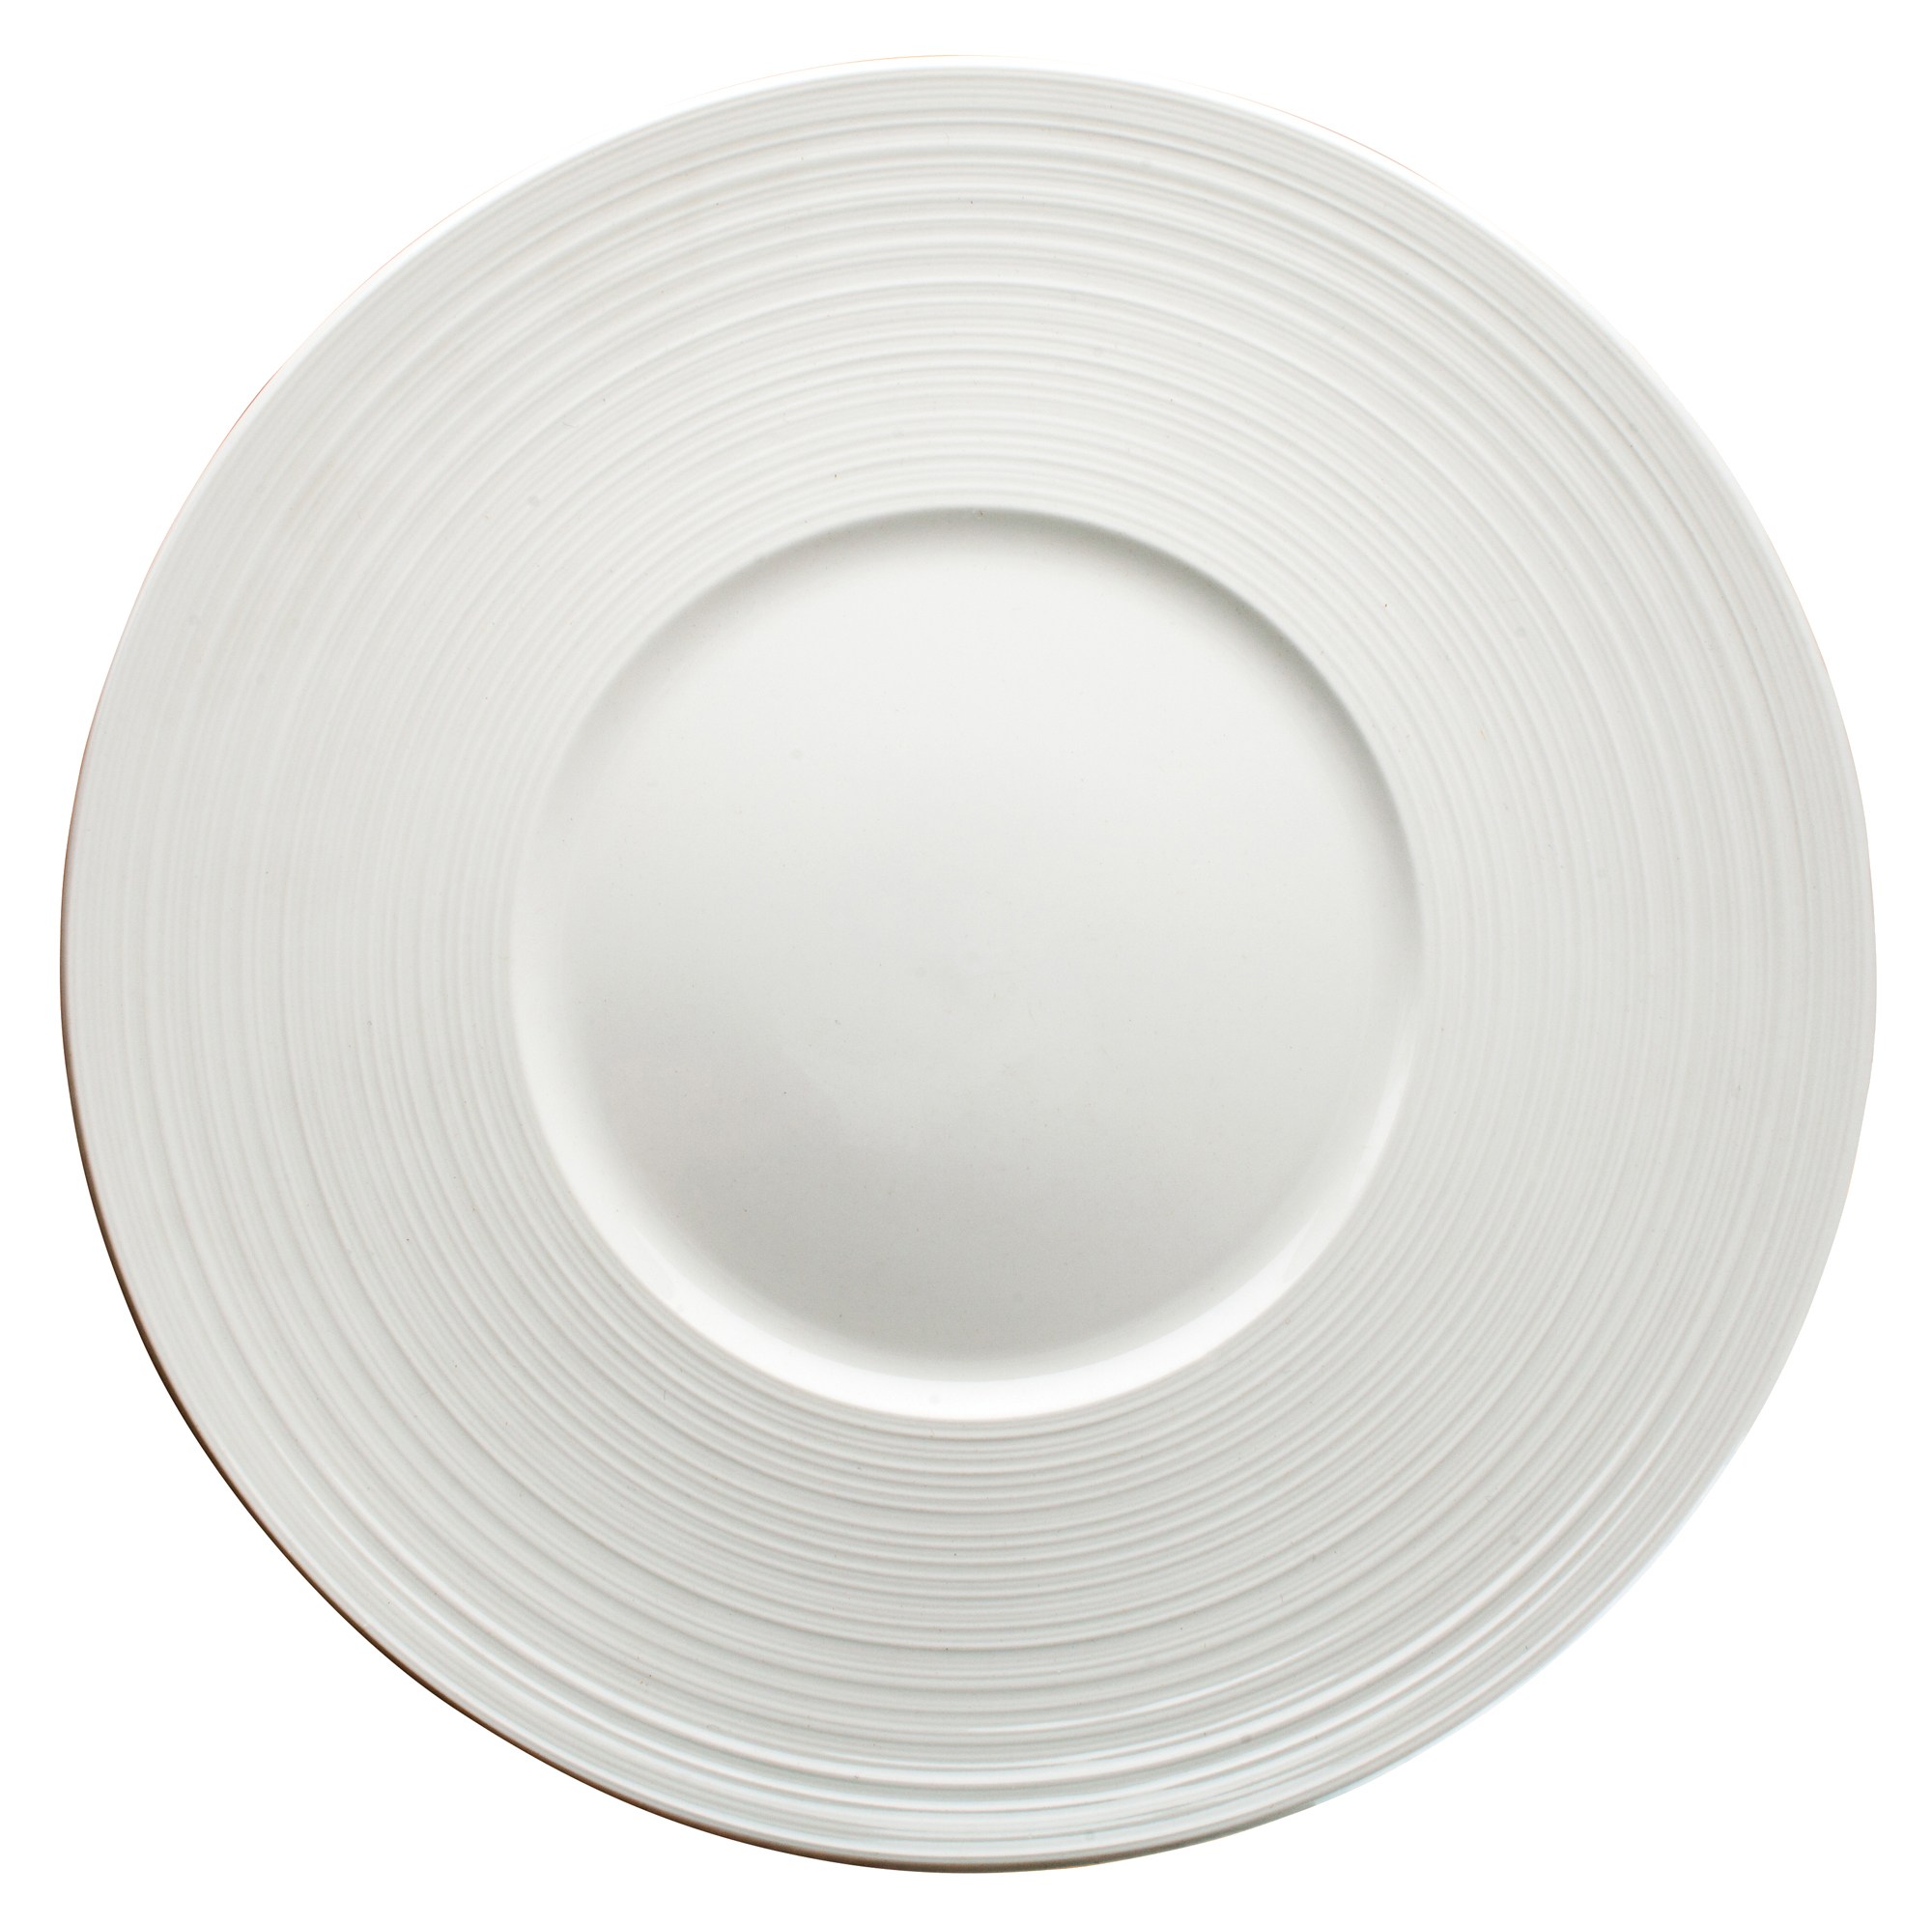 Winco WDP022-110 plate, china